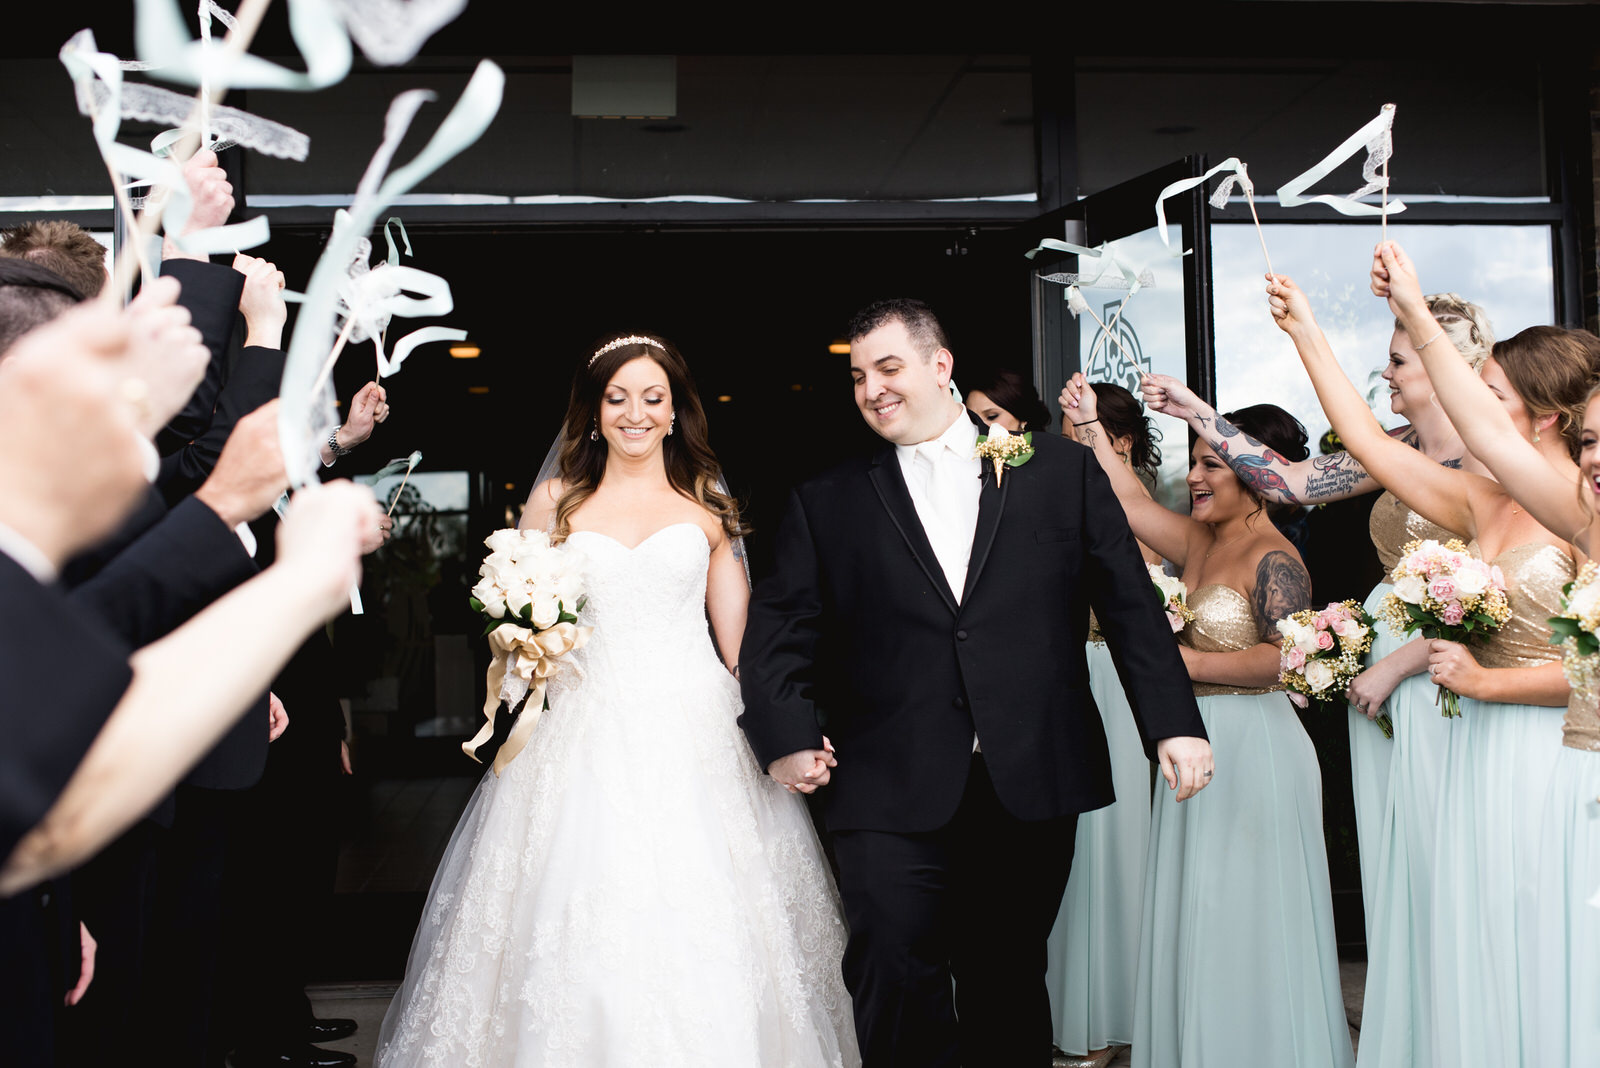 Laube_Banquet_Hall__Wedding_Photos_010.jpg